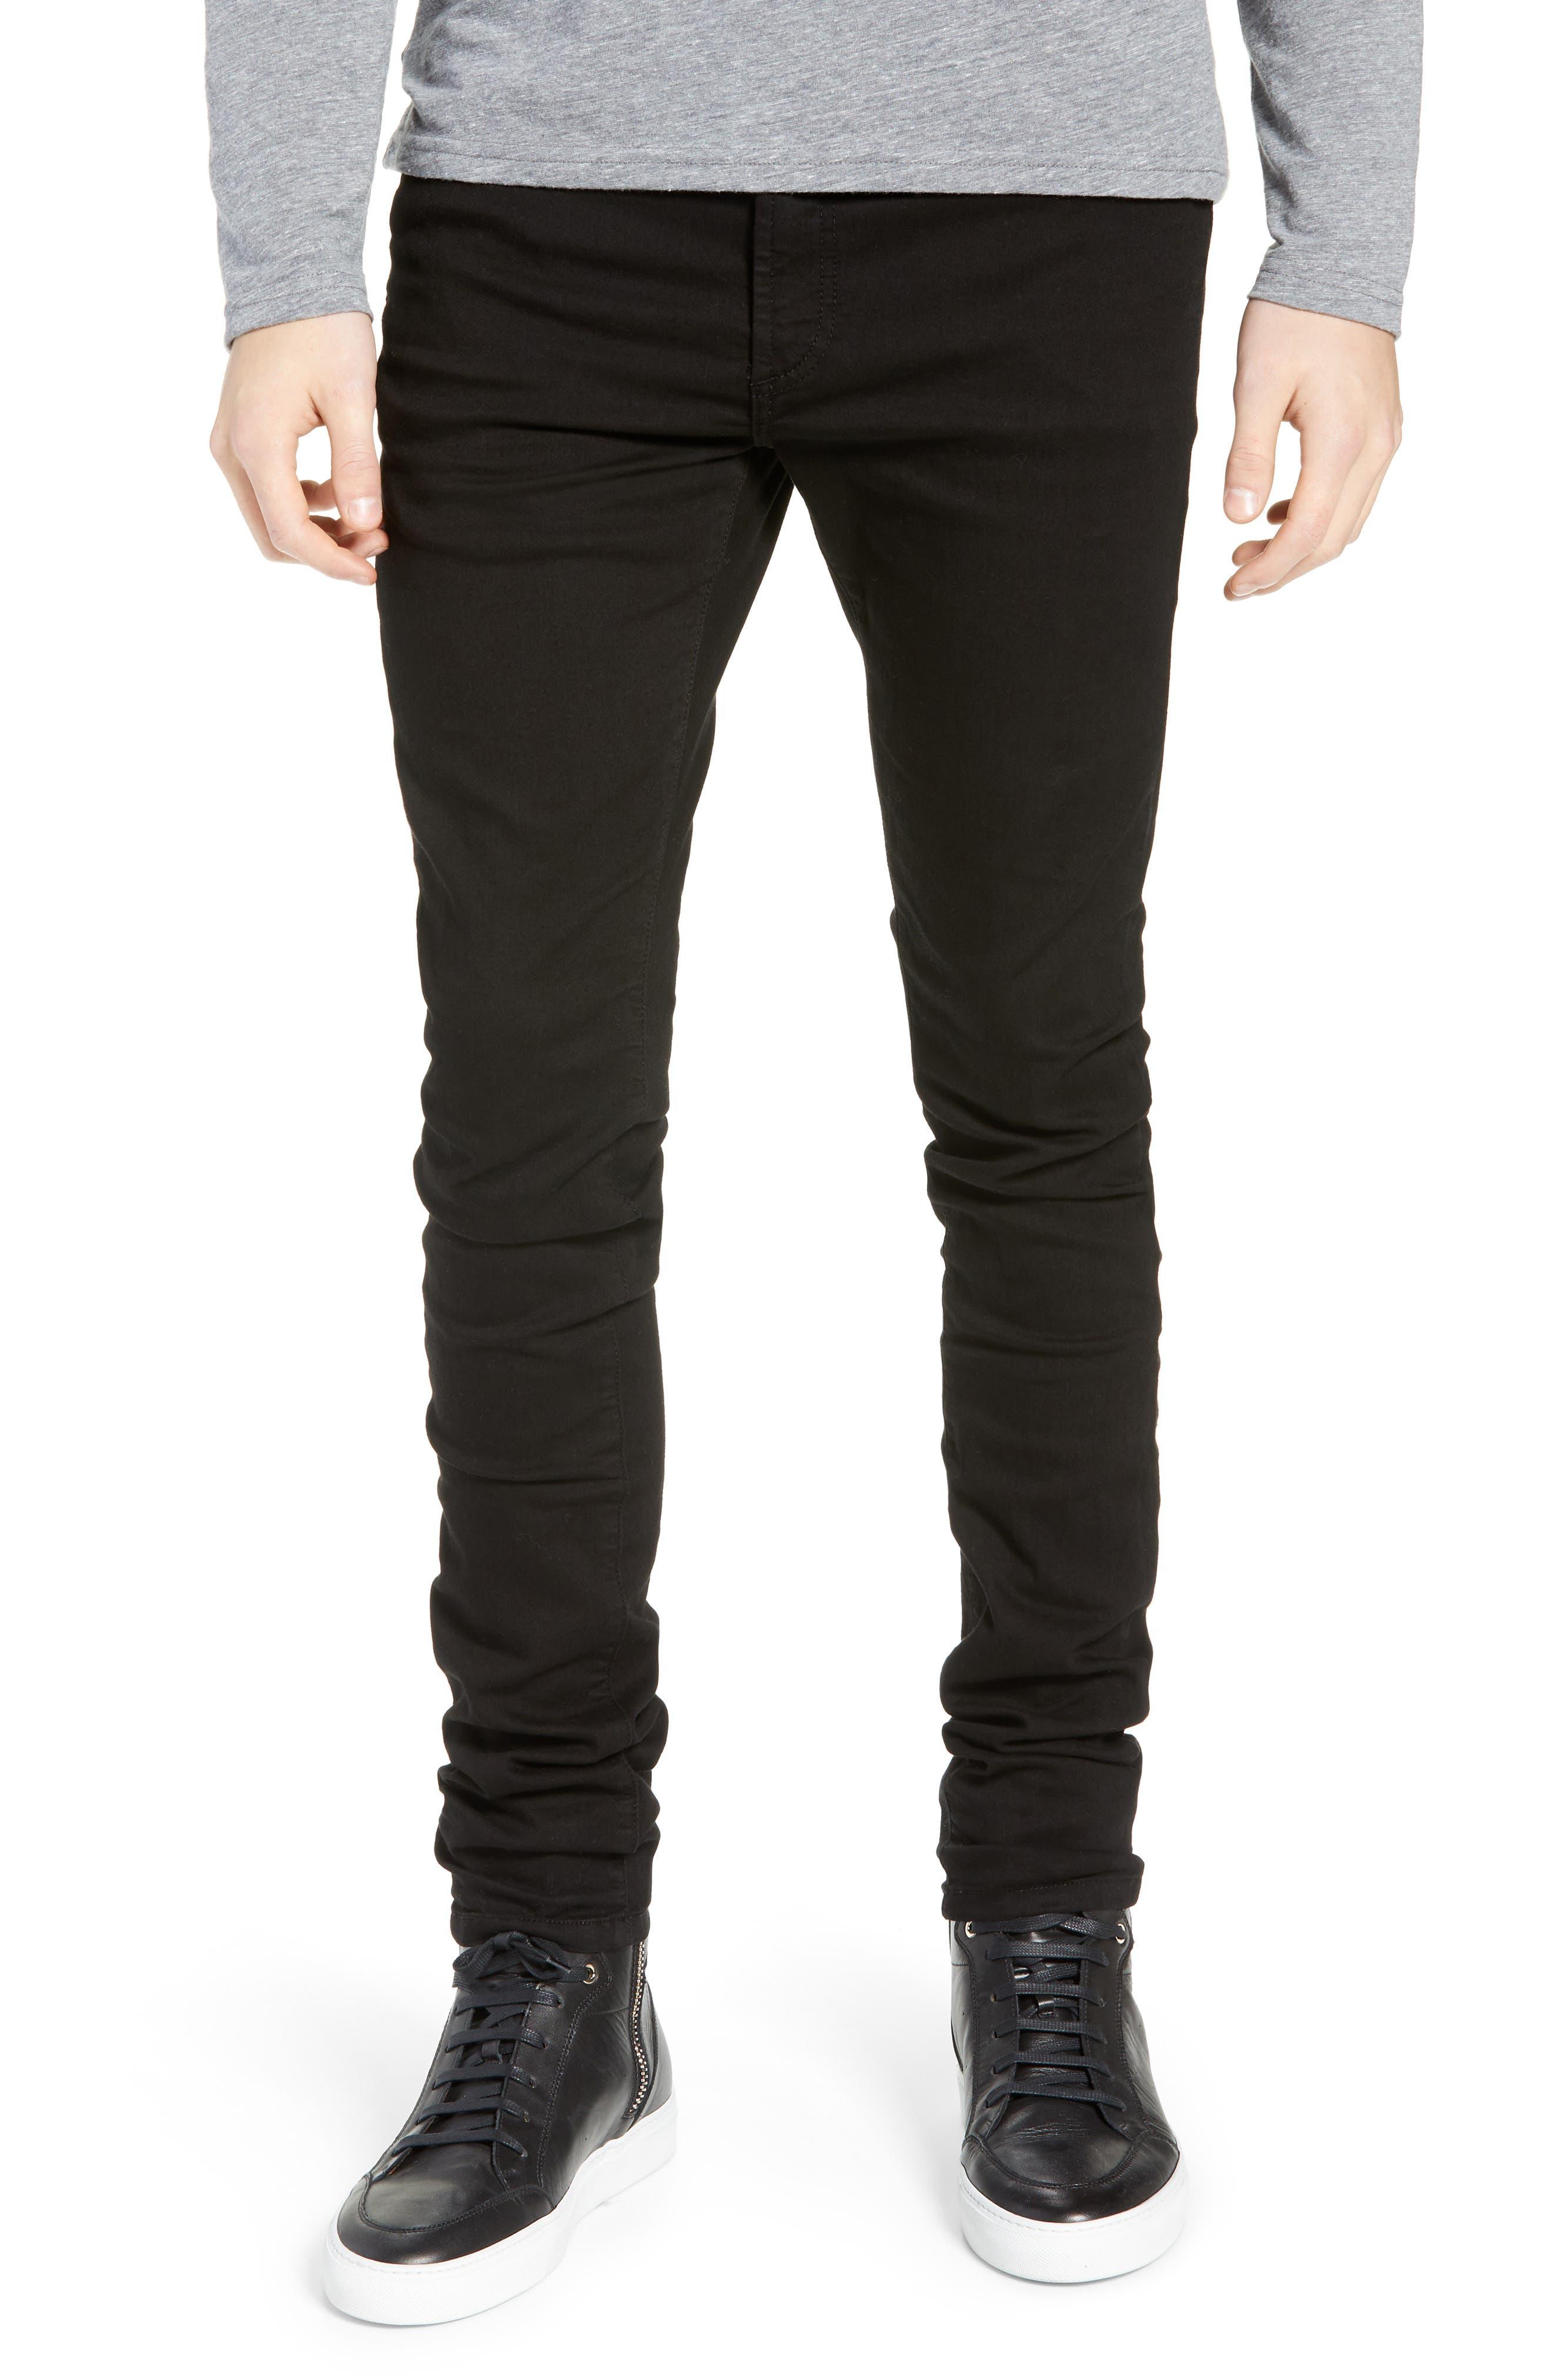 MONFRERE Greyson Skinny Fit Jeans in Noir